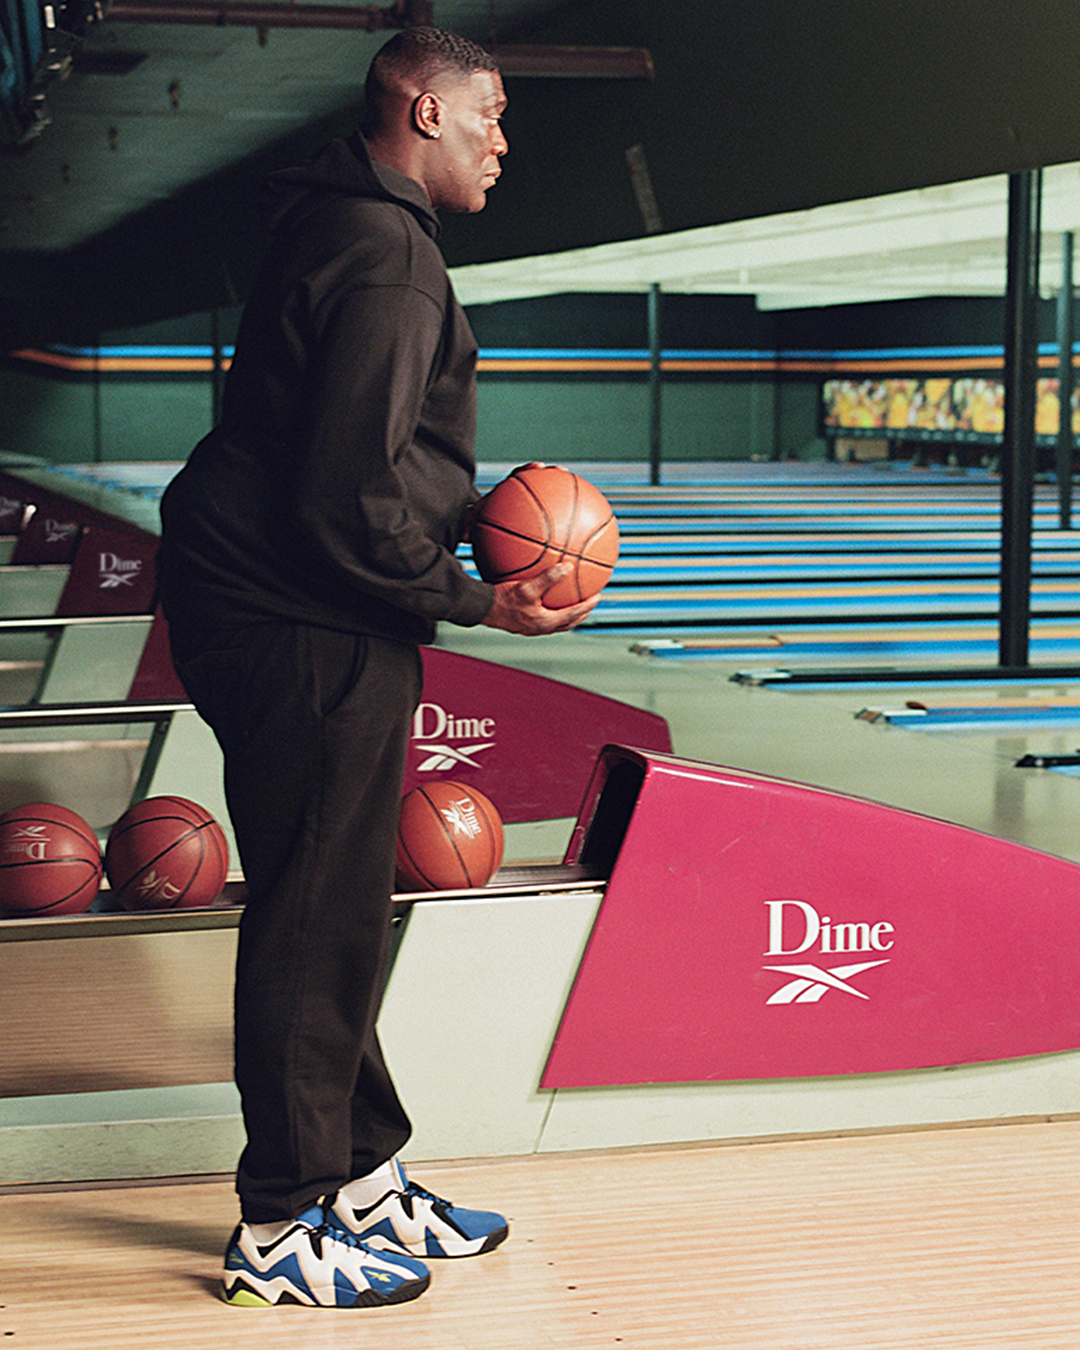 Reebok 与加拿大蒙特利尔滑板品牌Dime共同揭晓最新联名新品——Dime